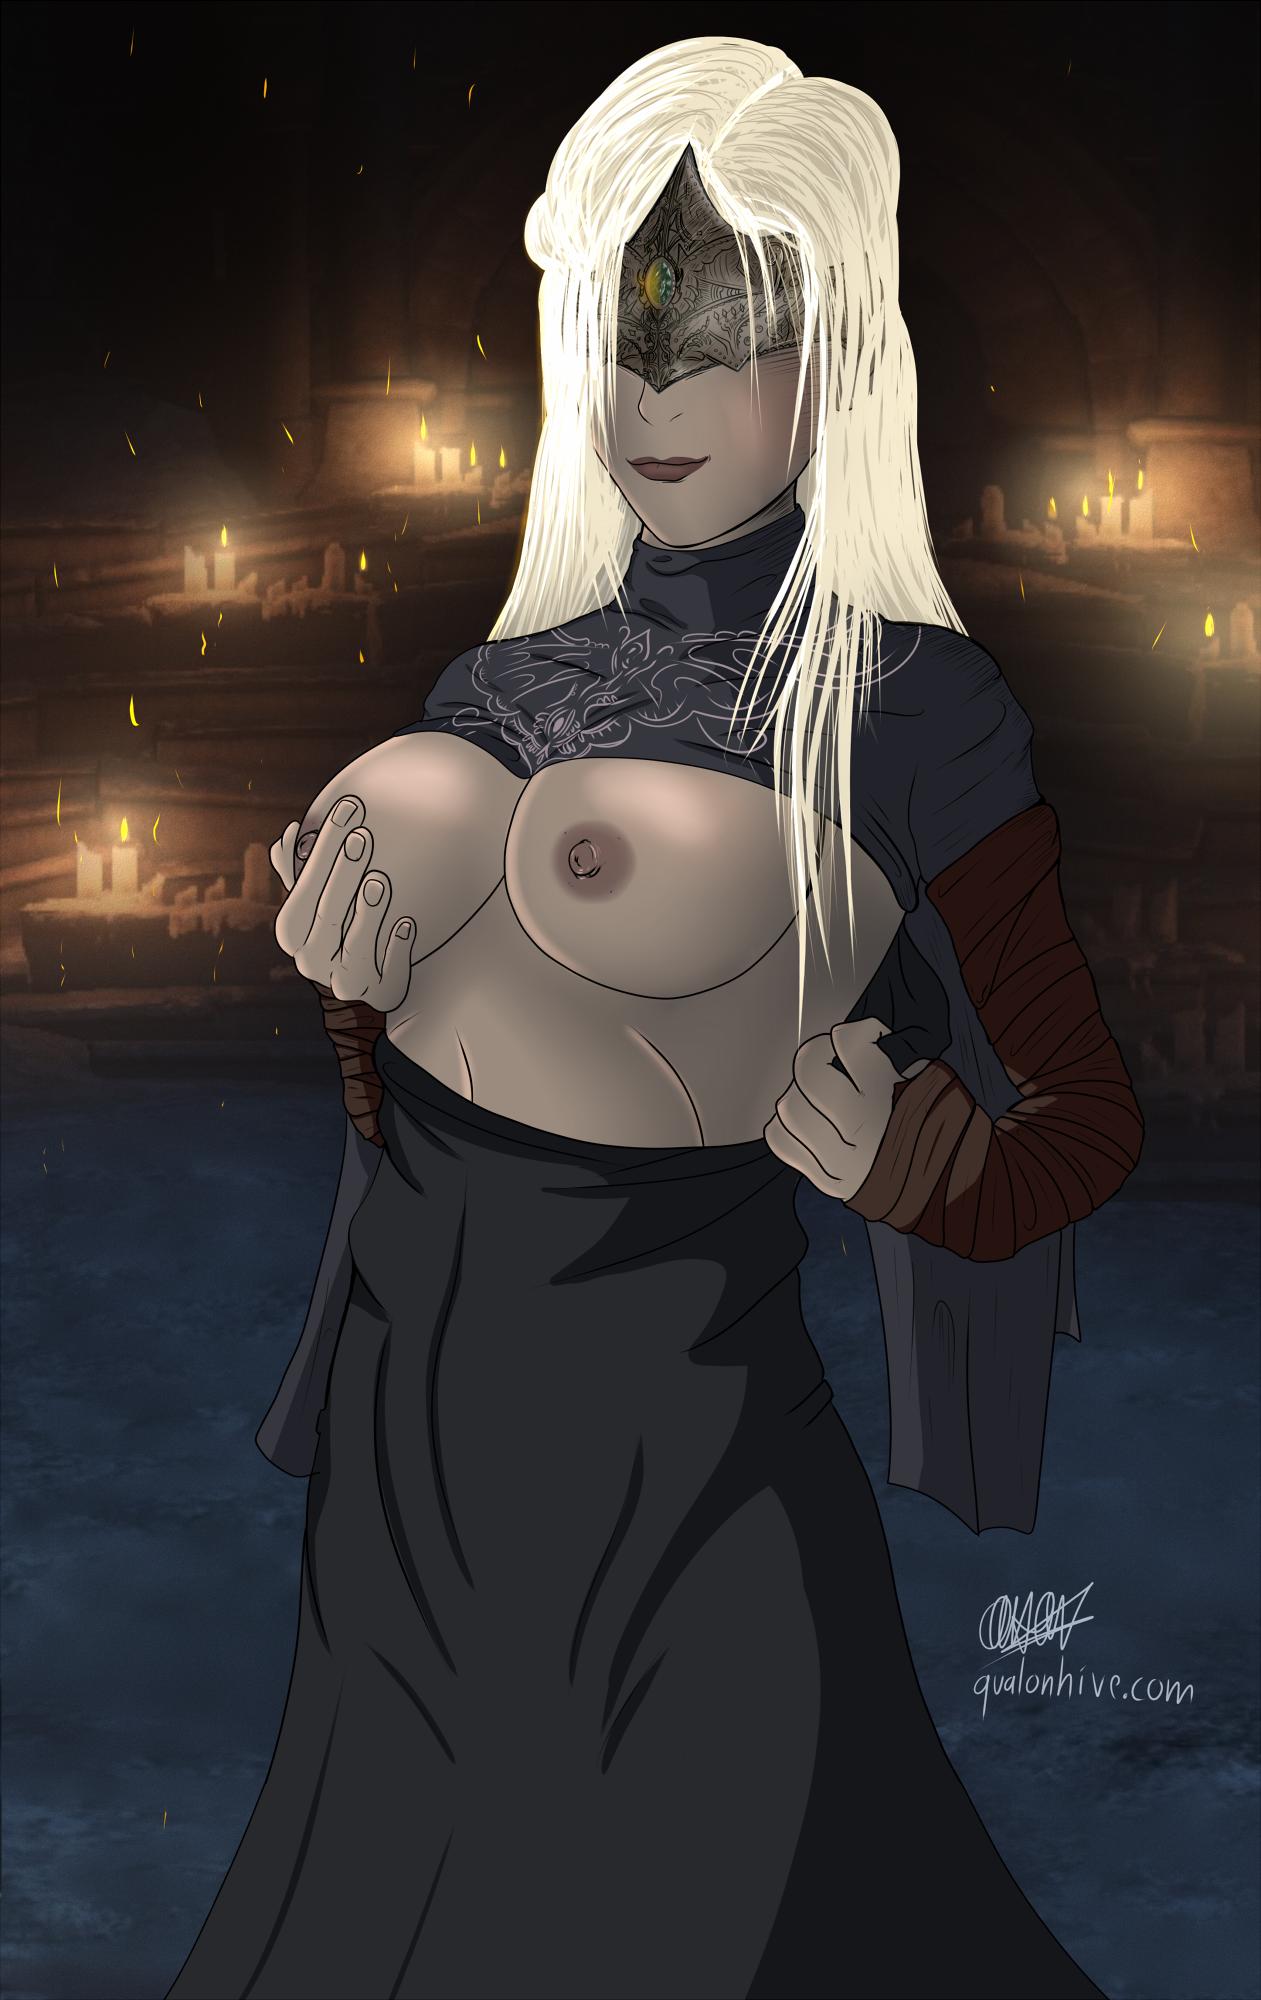 Dark Souls III : Fire Keeper *Patreon Poll*